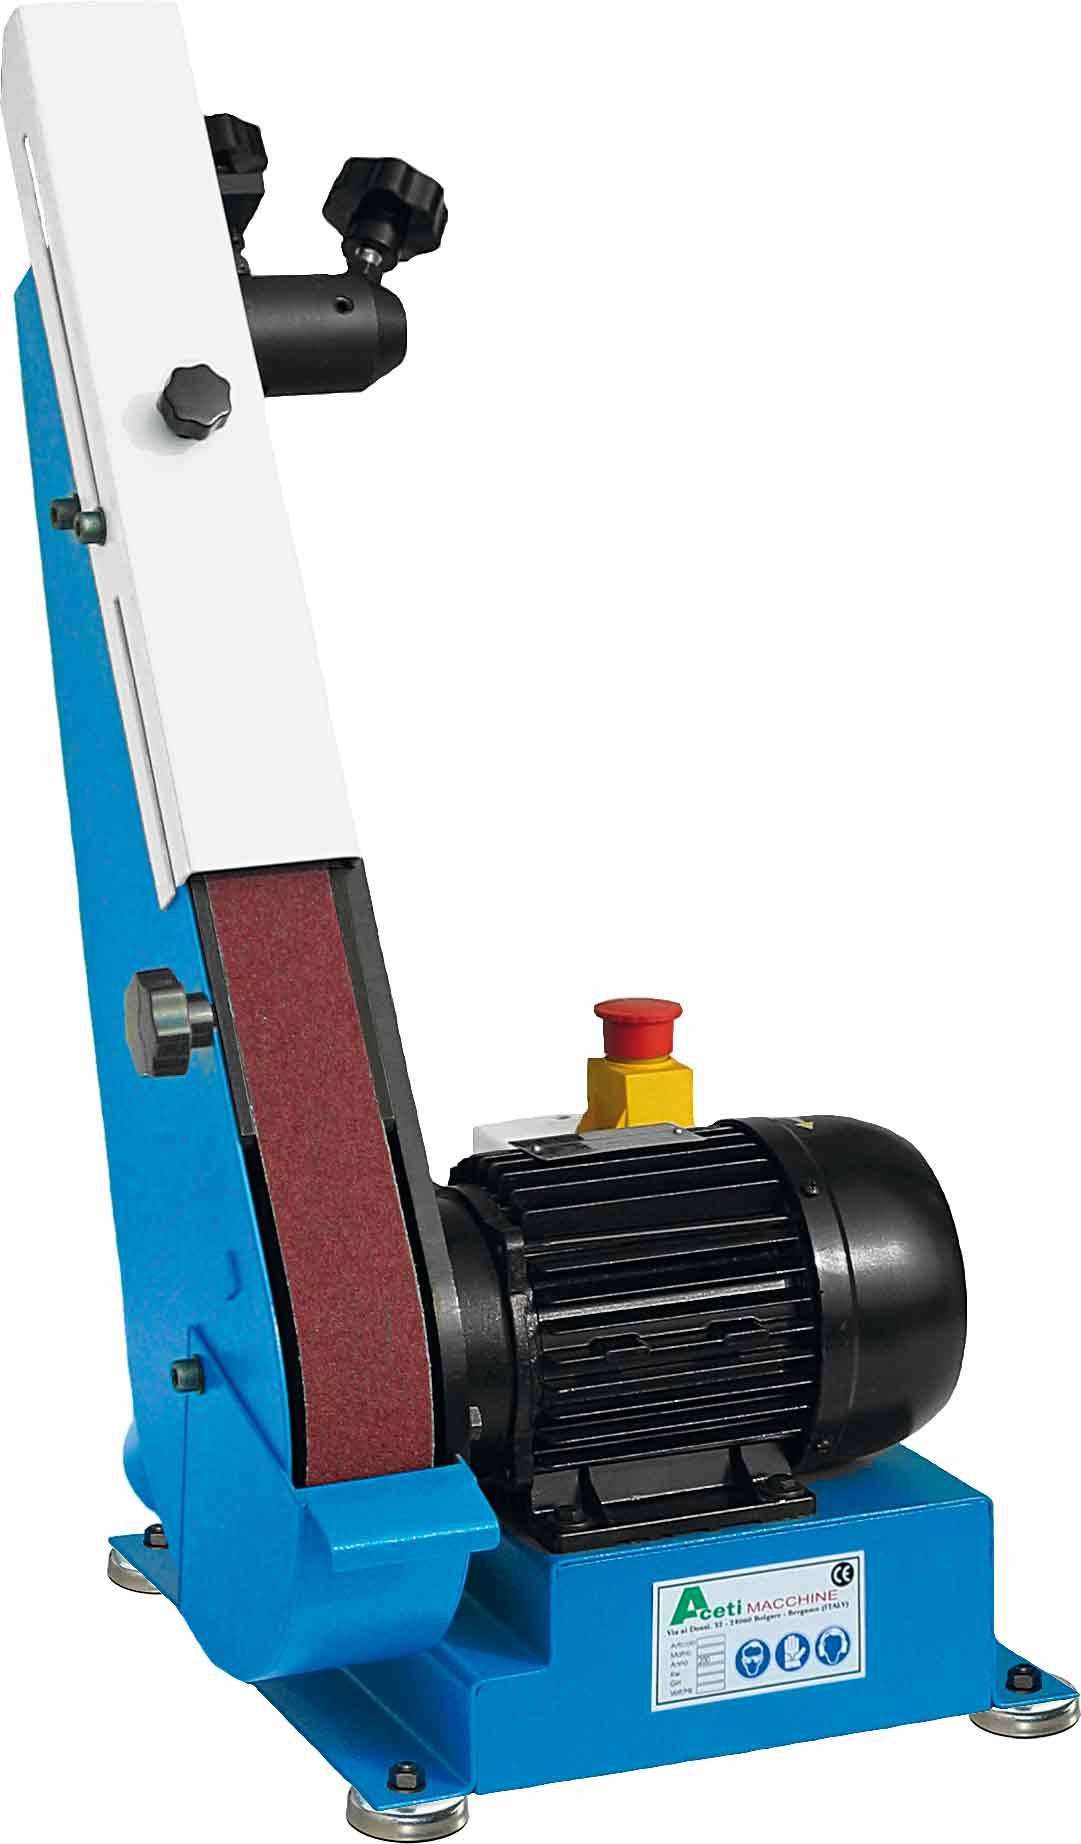 ART.86 - Belt grinding machine